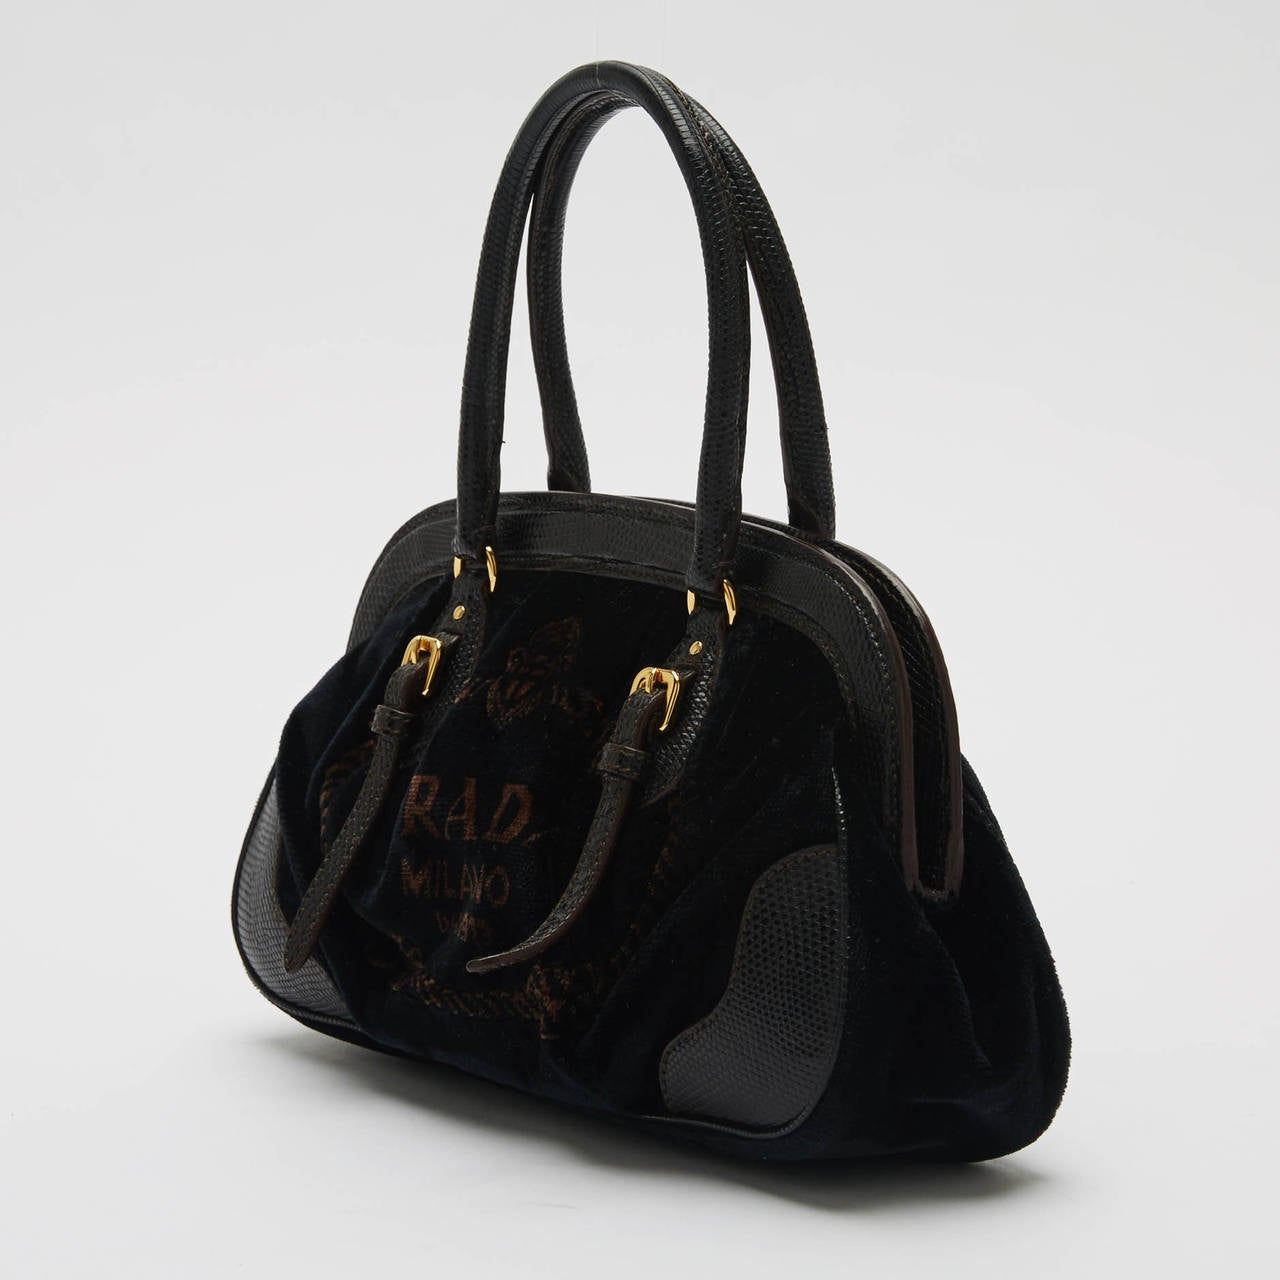 prada tessuto handbag - Prada Frame Bag Velvet With Leather Trim Small at 1stdibs